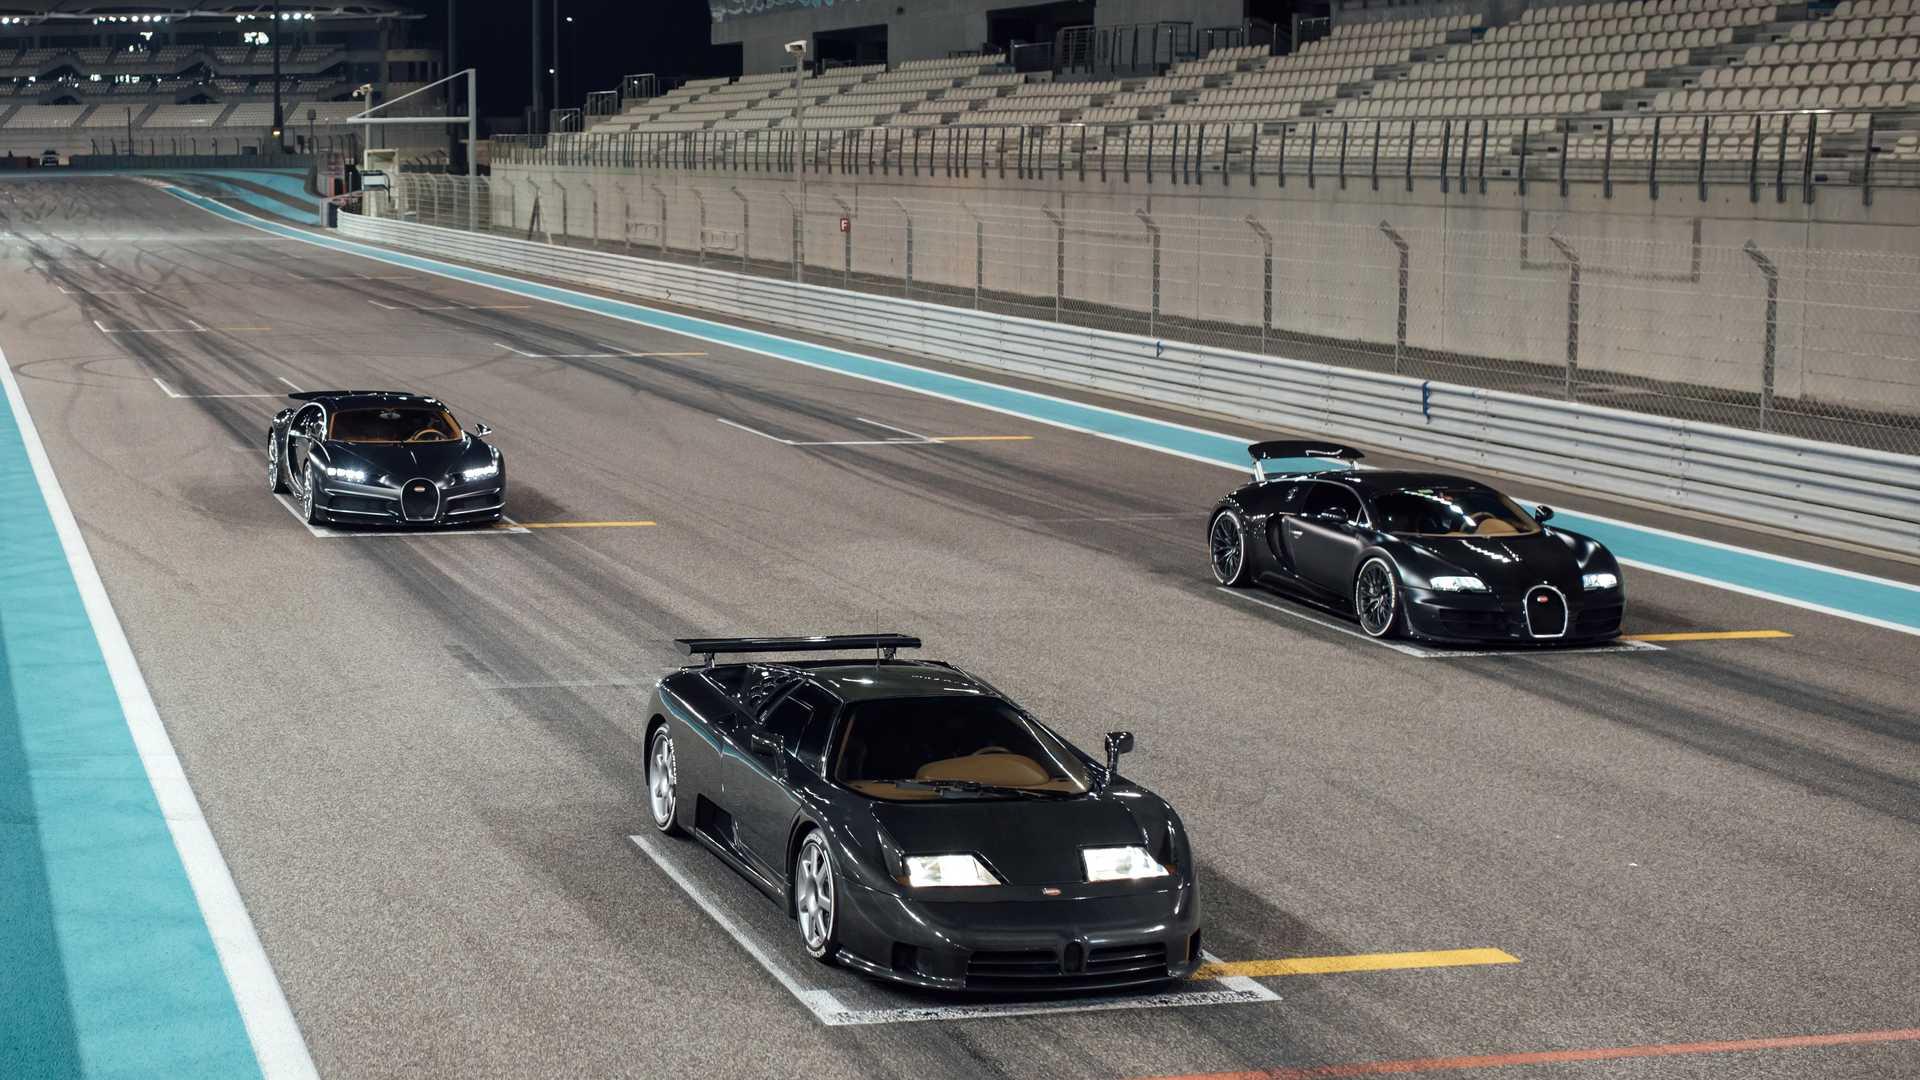 bugatti-chiron-veyron-and-eb110-in-dubai-4